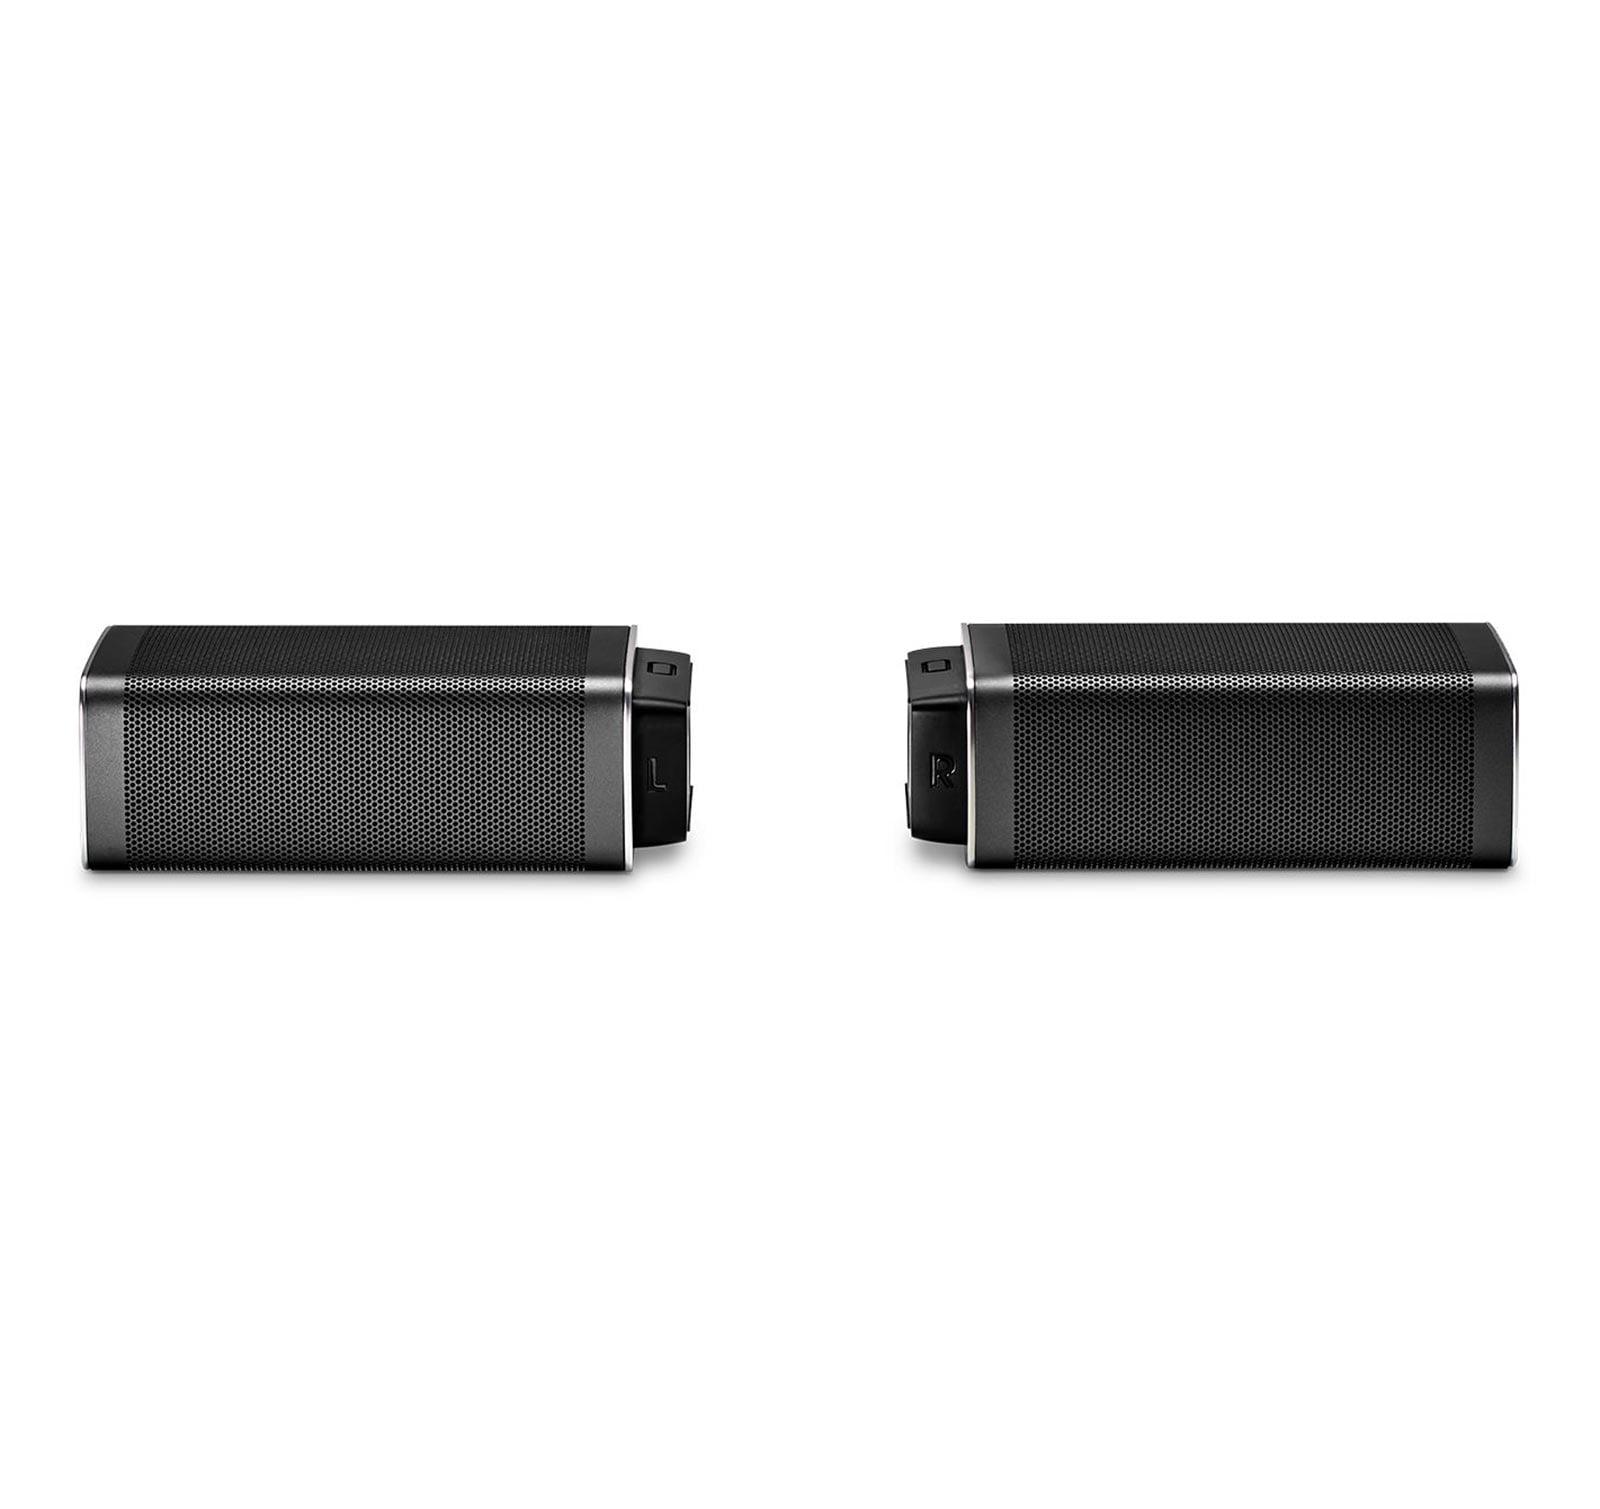 JBL Bar 5.1 Open Box 4K Ultra HD Soundbar